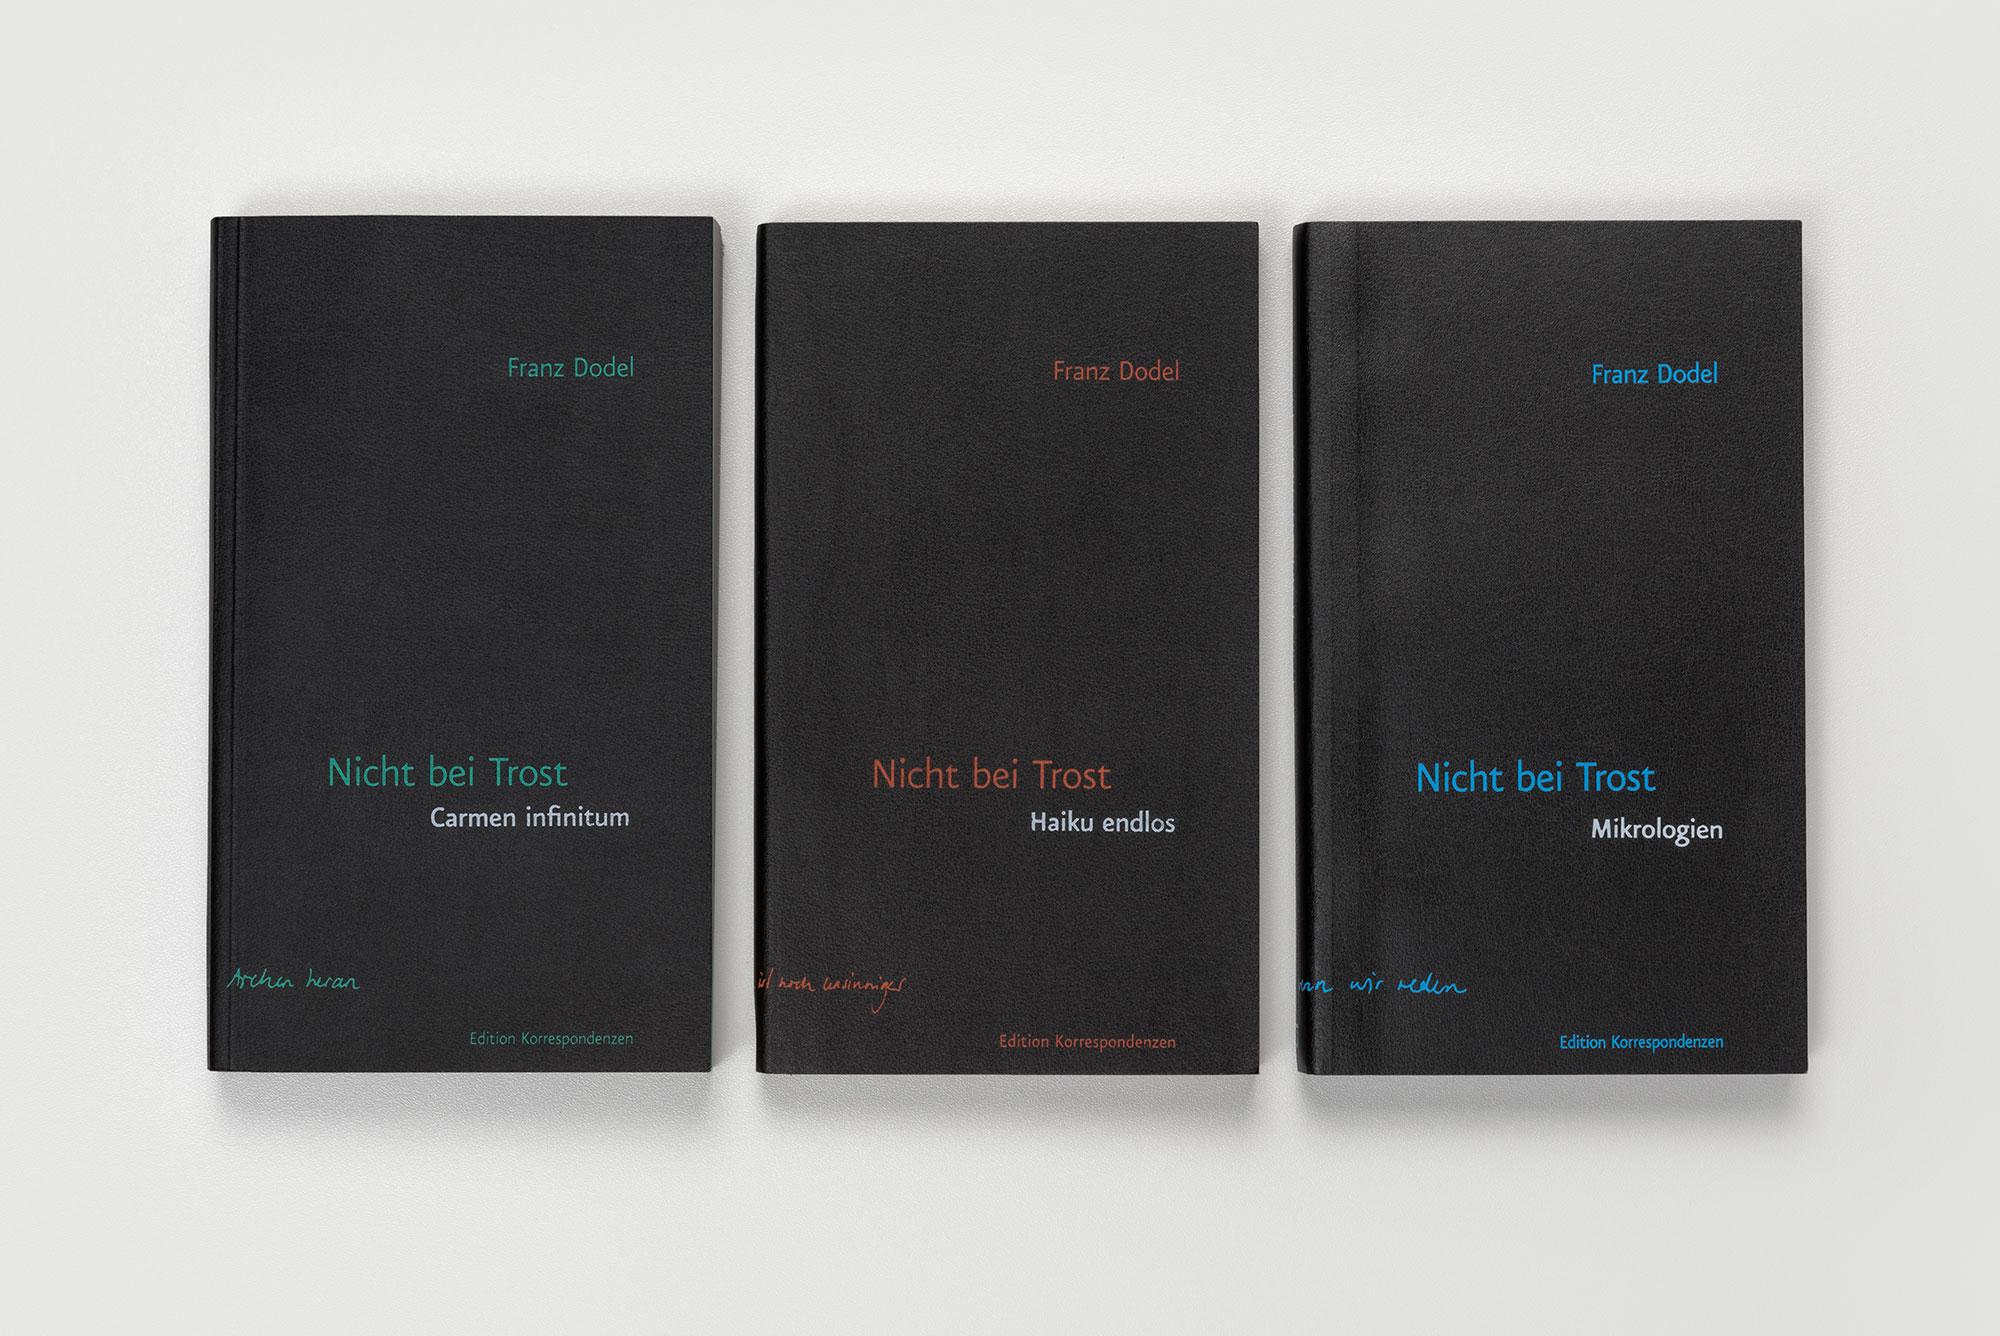 Frand Dodel – Nicht bei Trost, books ©Atelier Pol